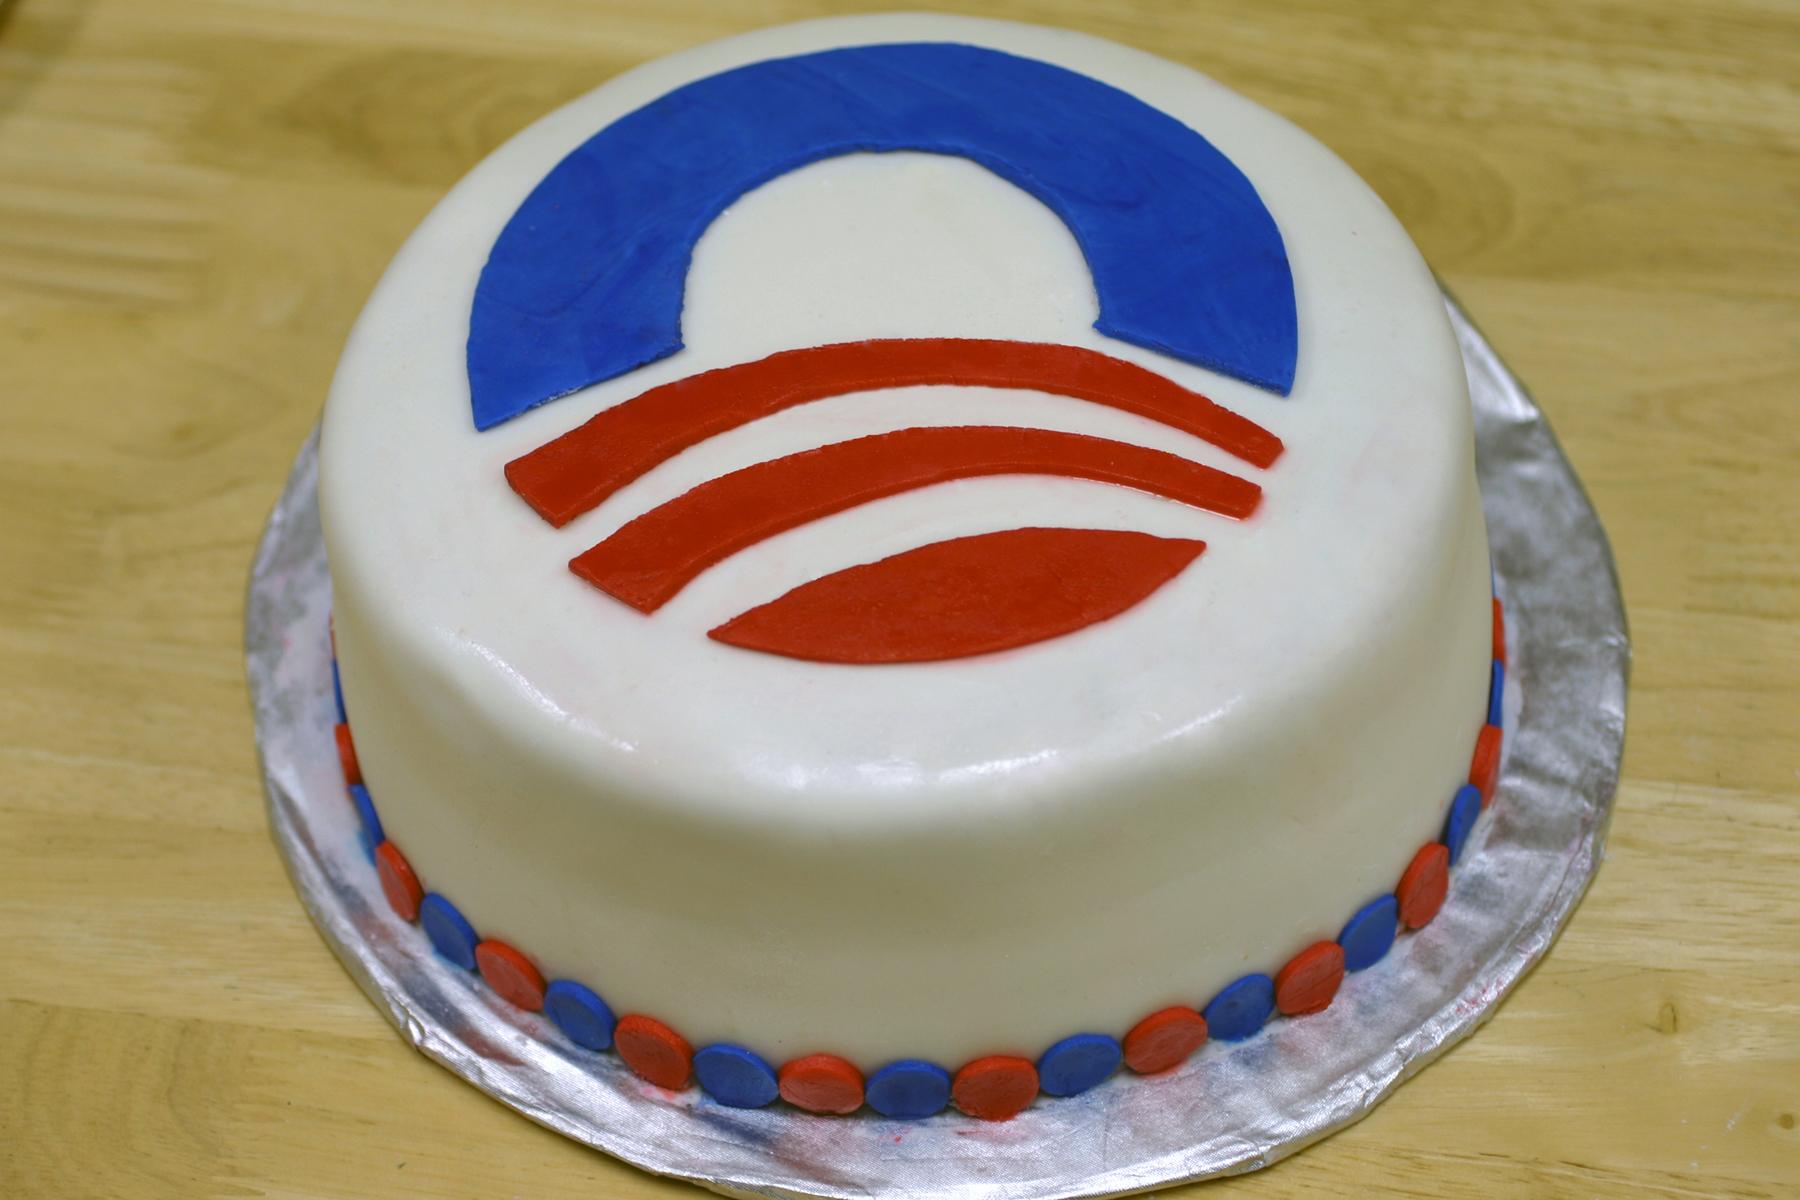 Groovy Obama Everything Else Is Cake Funny Birthday Cards Online Inifodamsfinfo